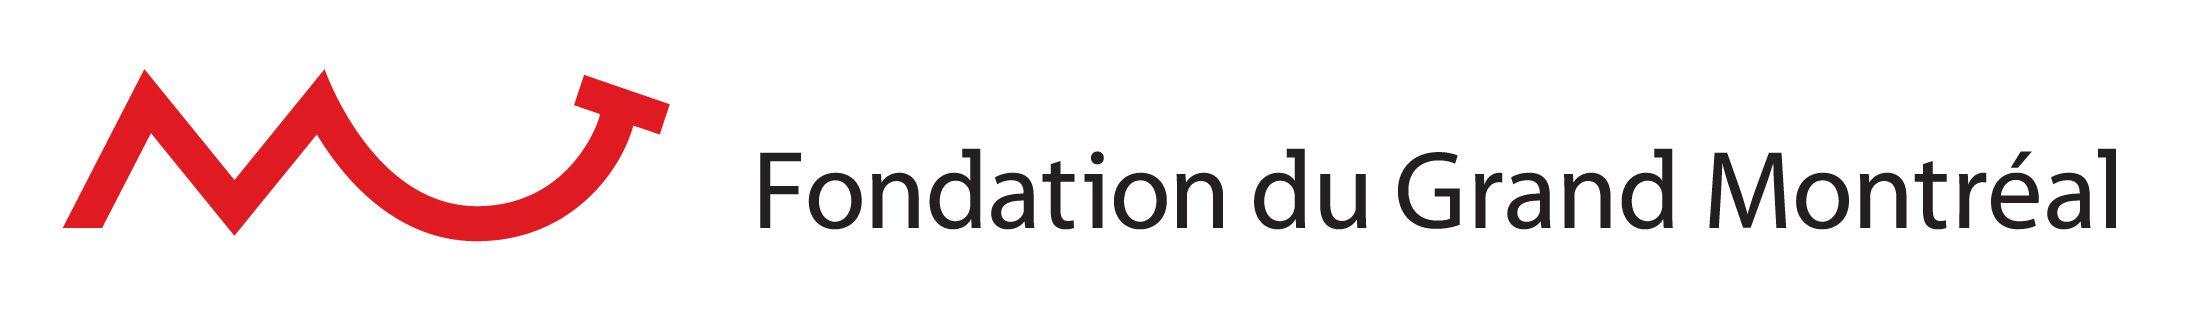 logo FGM